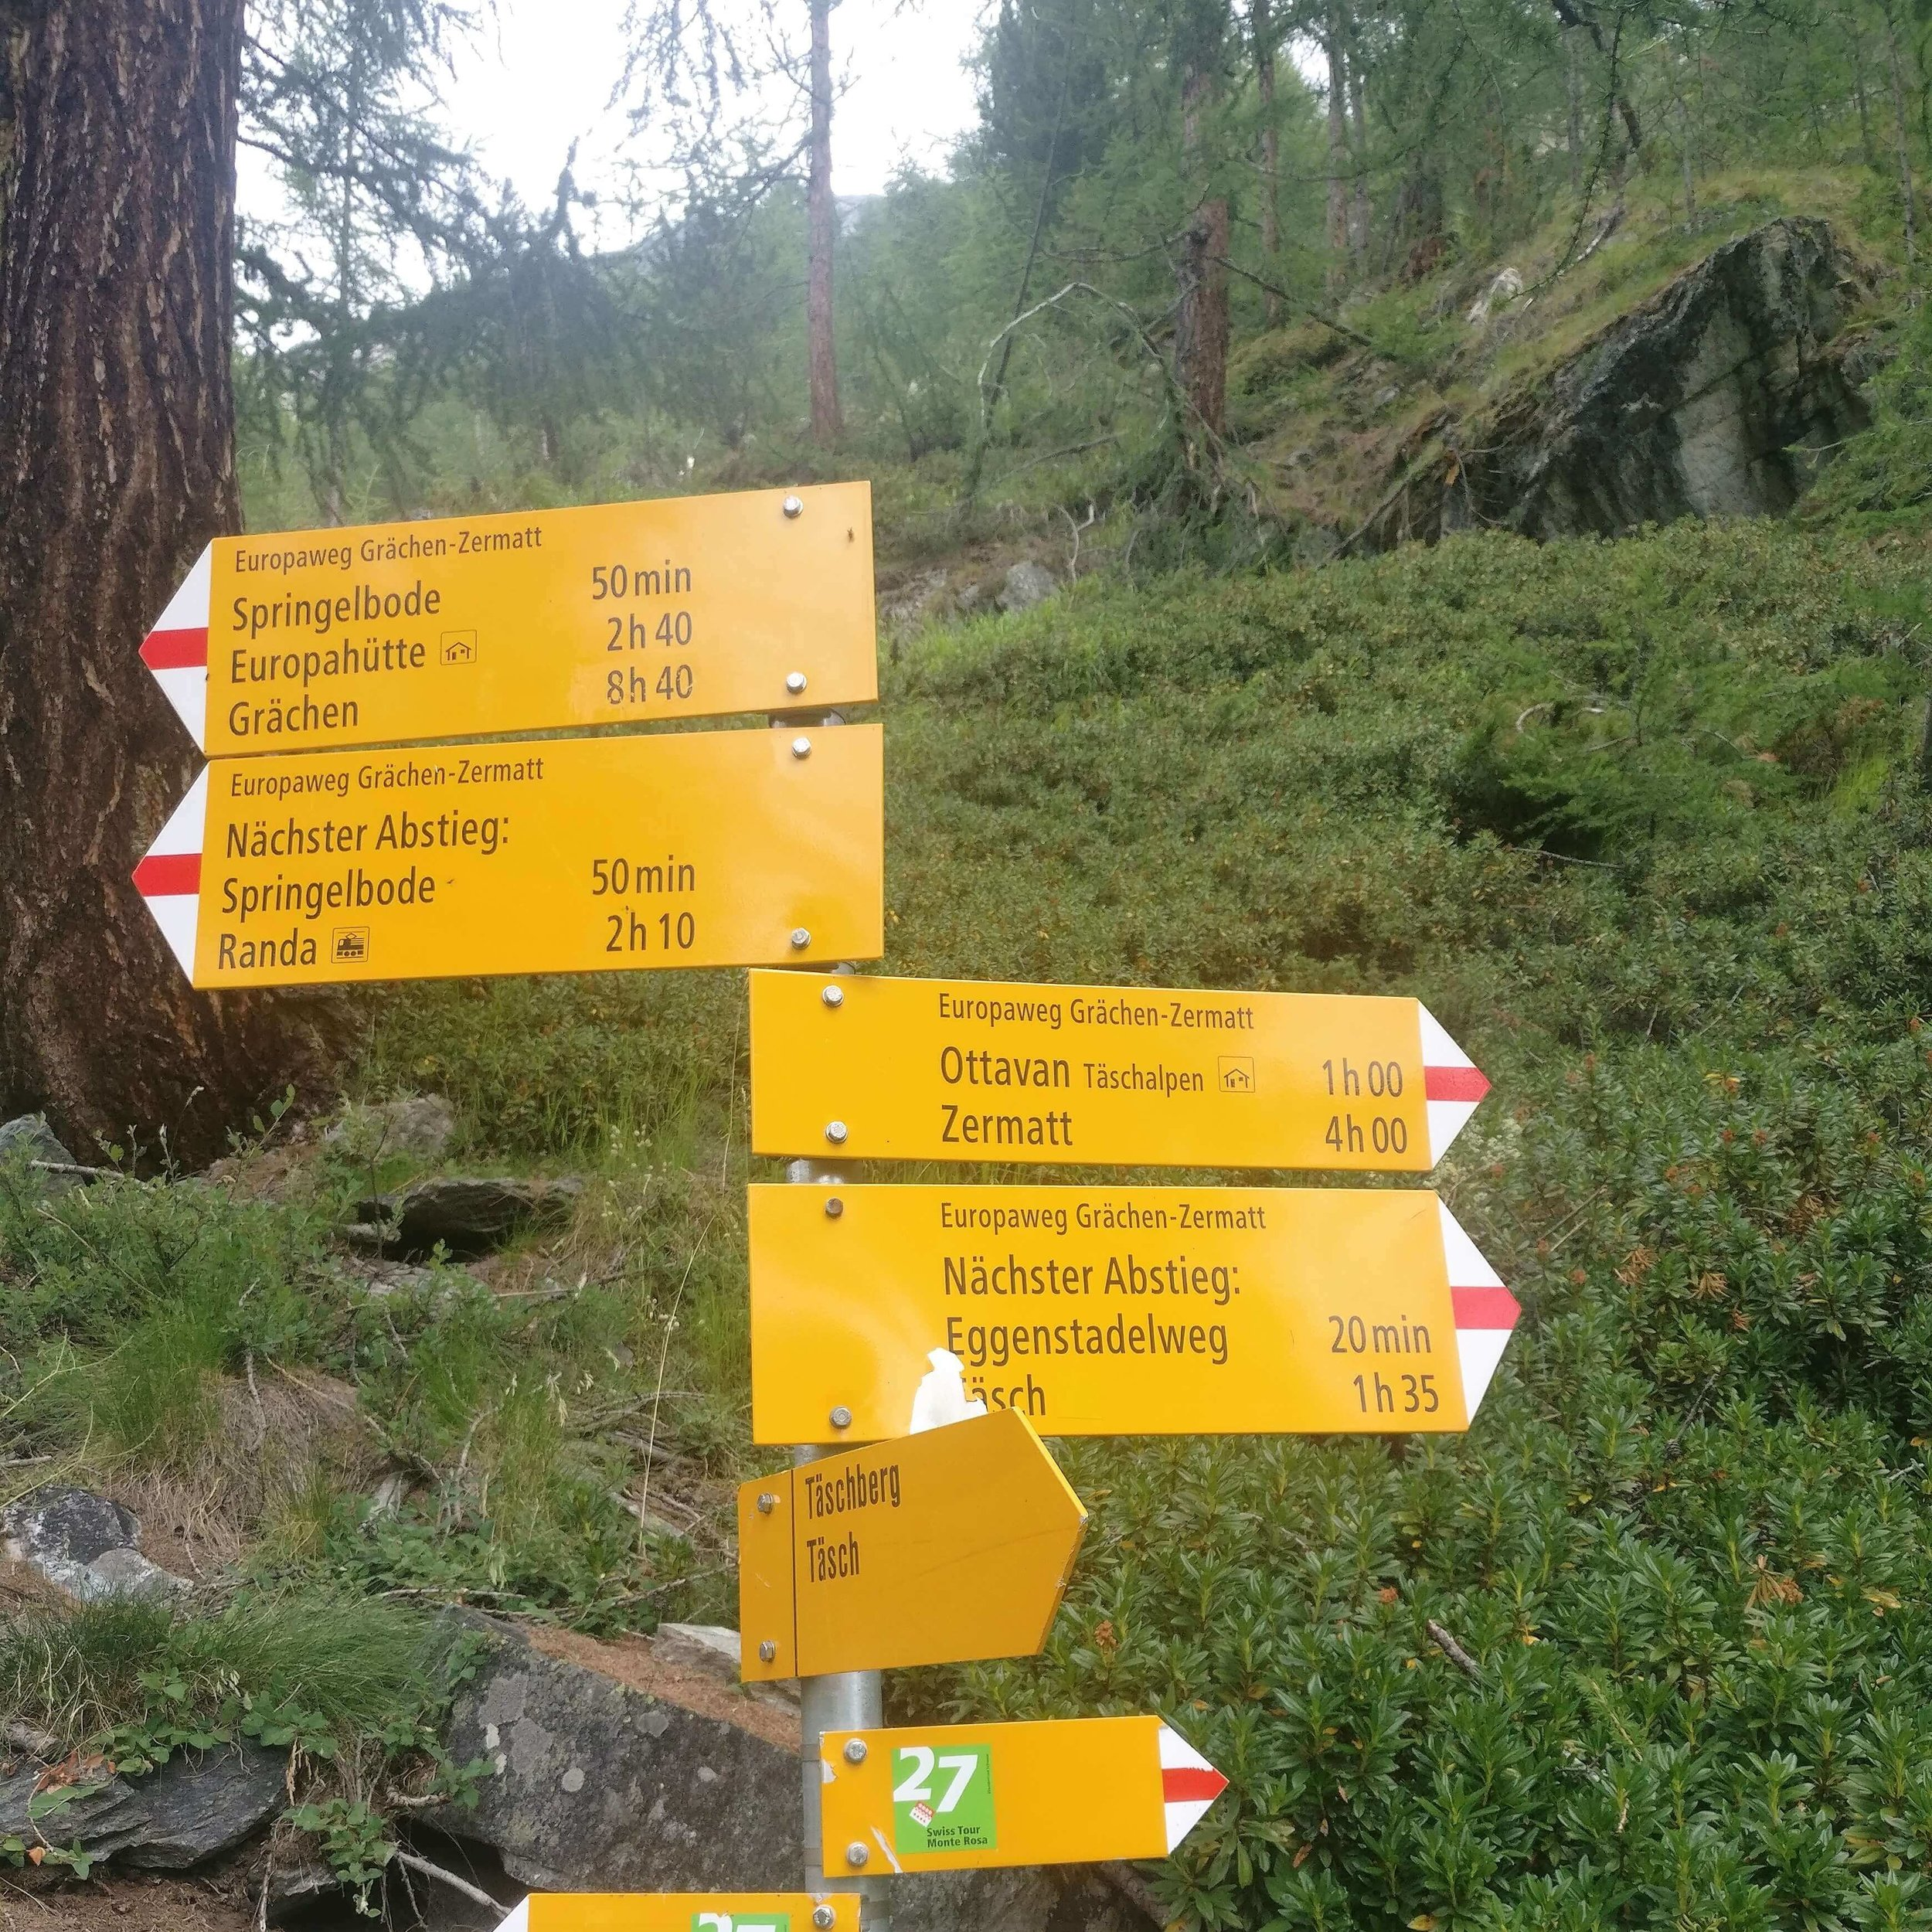 Europaweghut:  It is listed as Ottavan Taschalpen on the Europaweg trail signs.